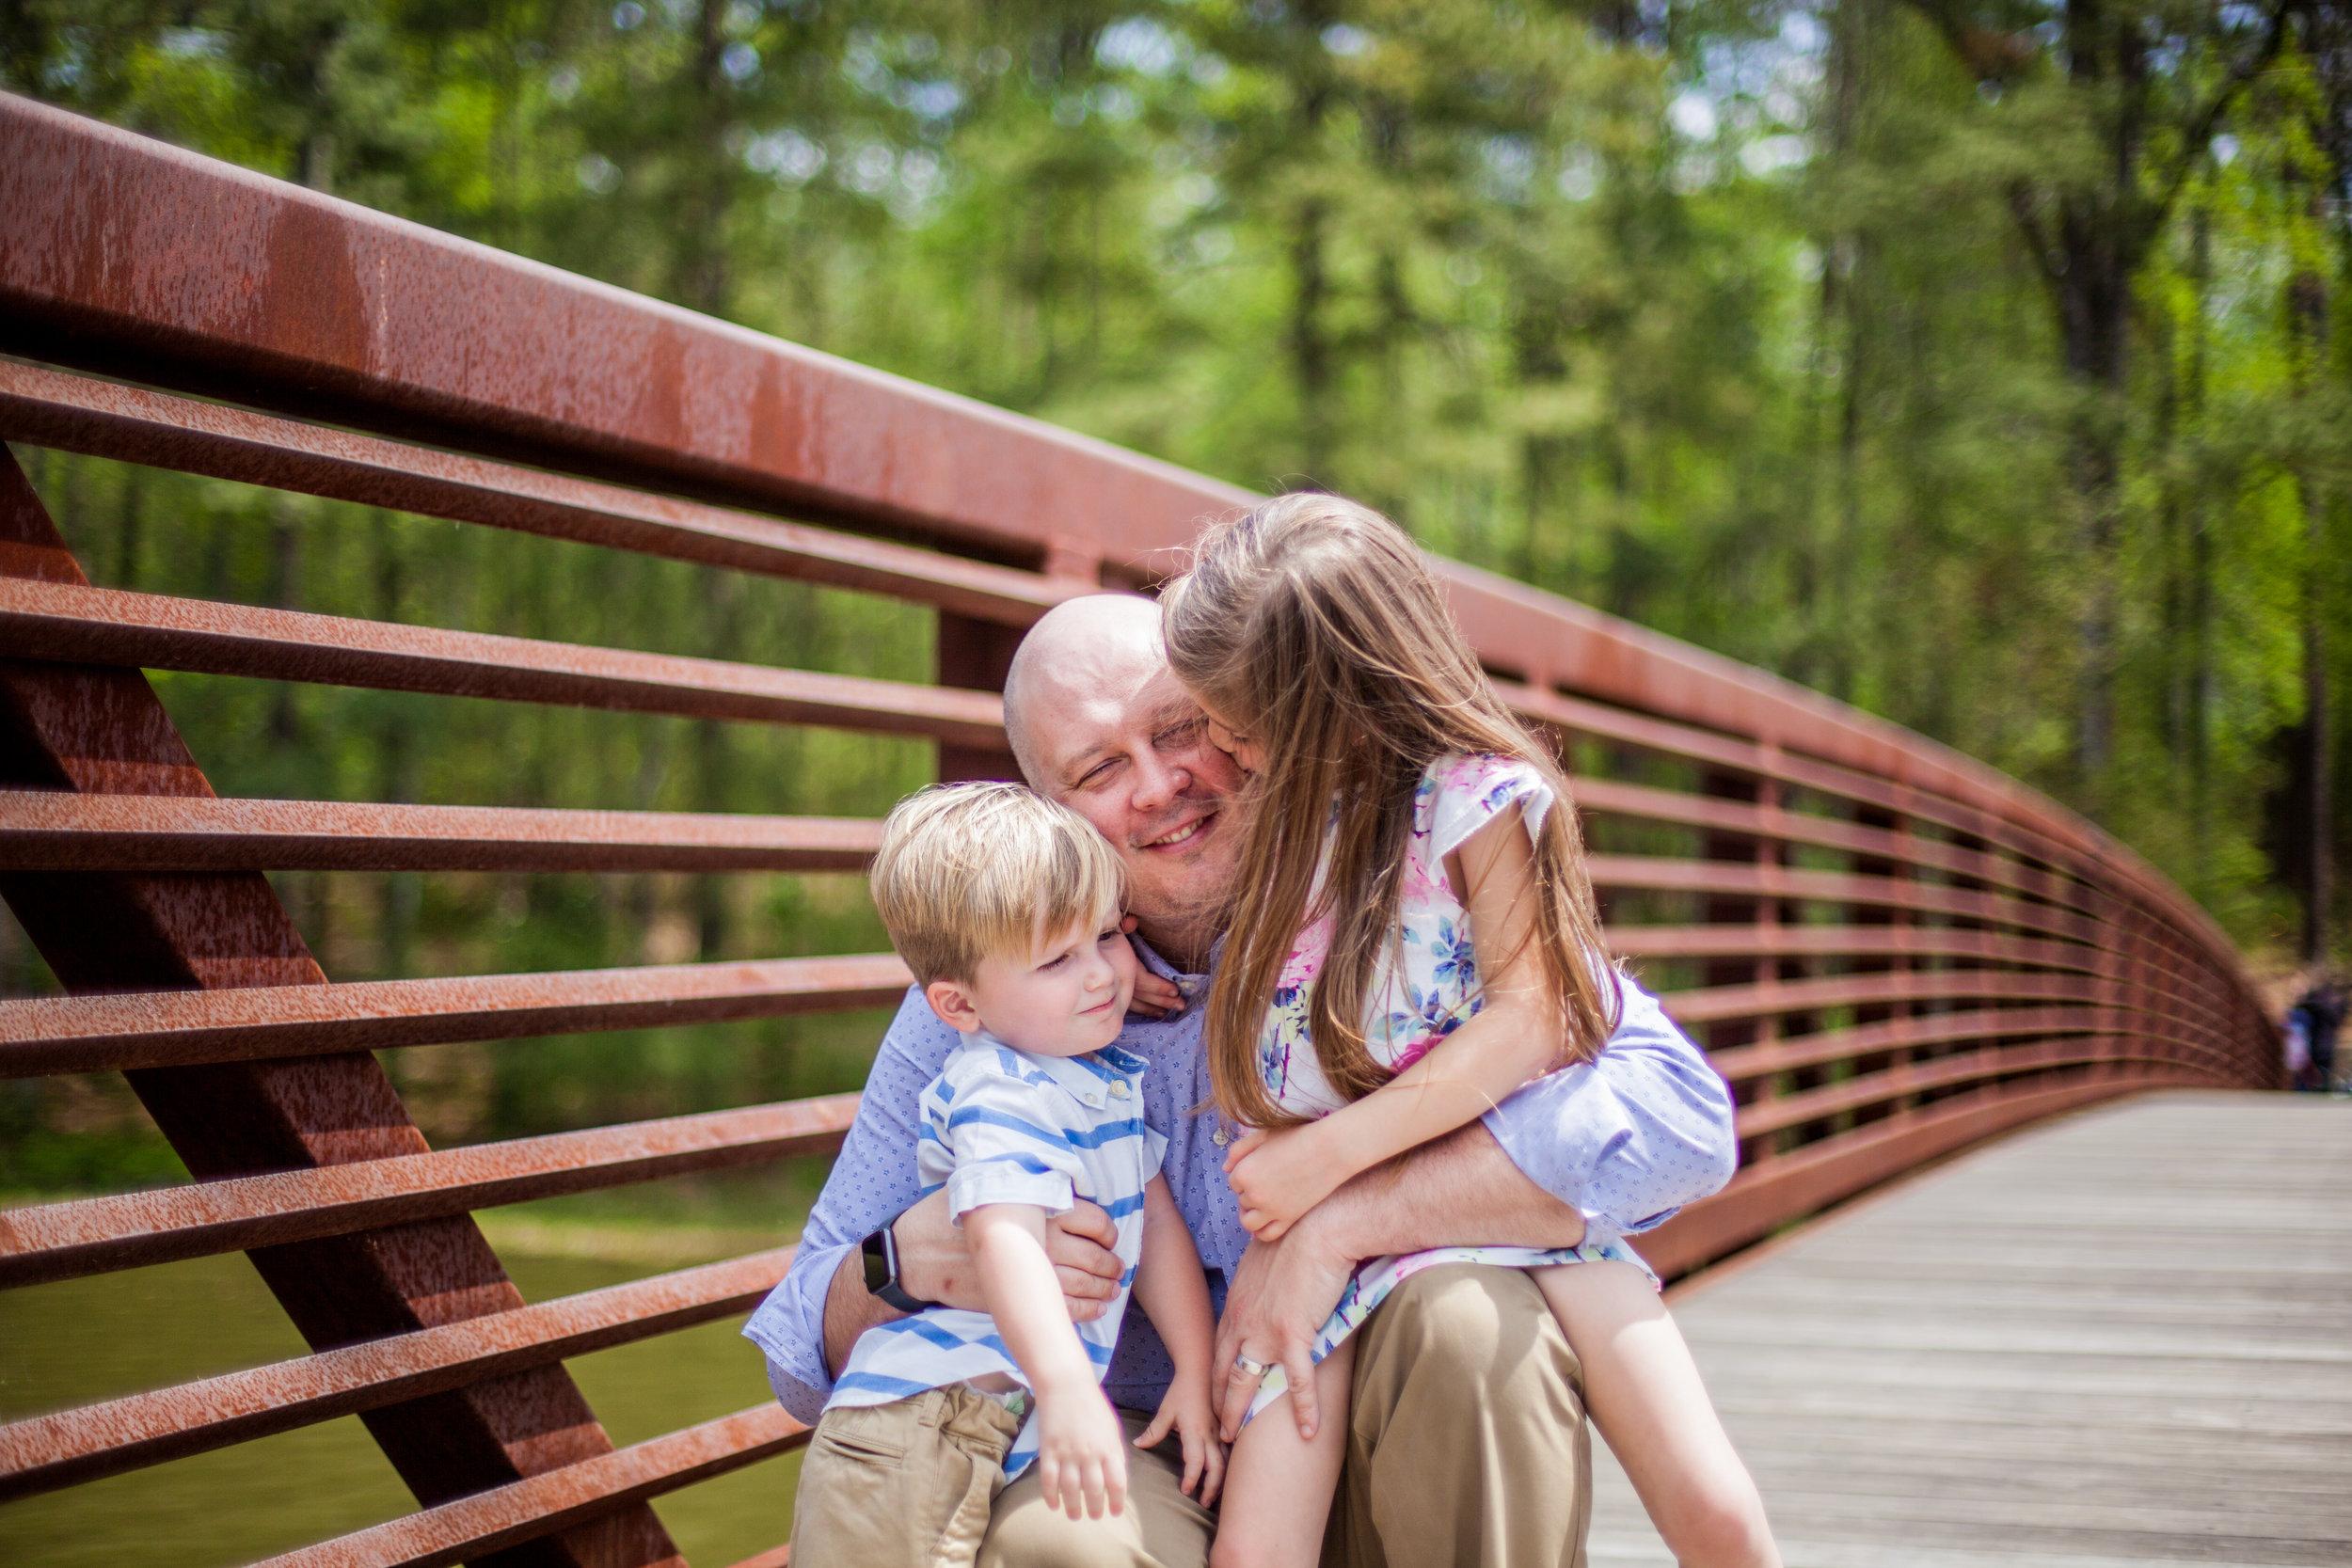 woodstock-family-photography-mini-session-acworth-beach-82.jpg